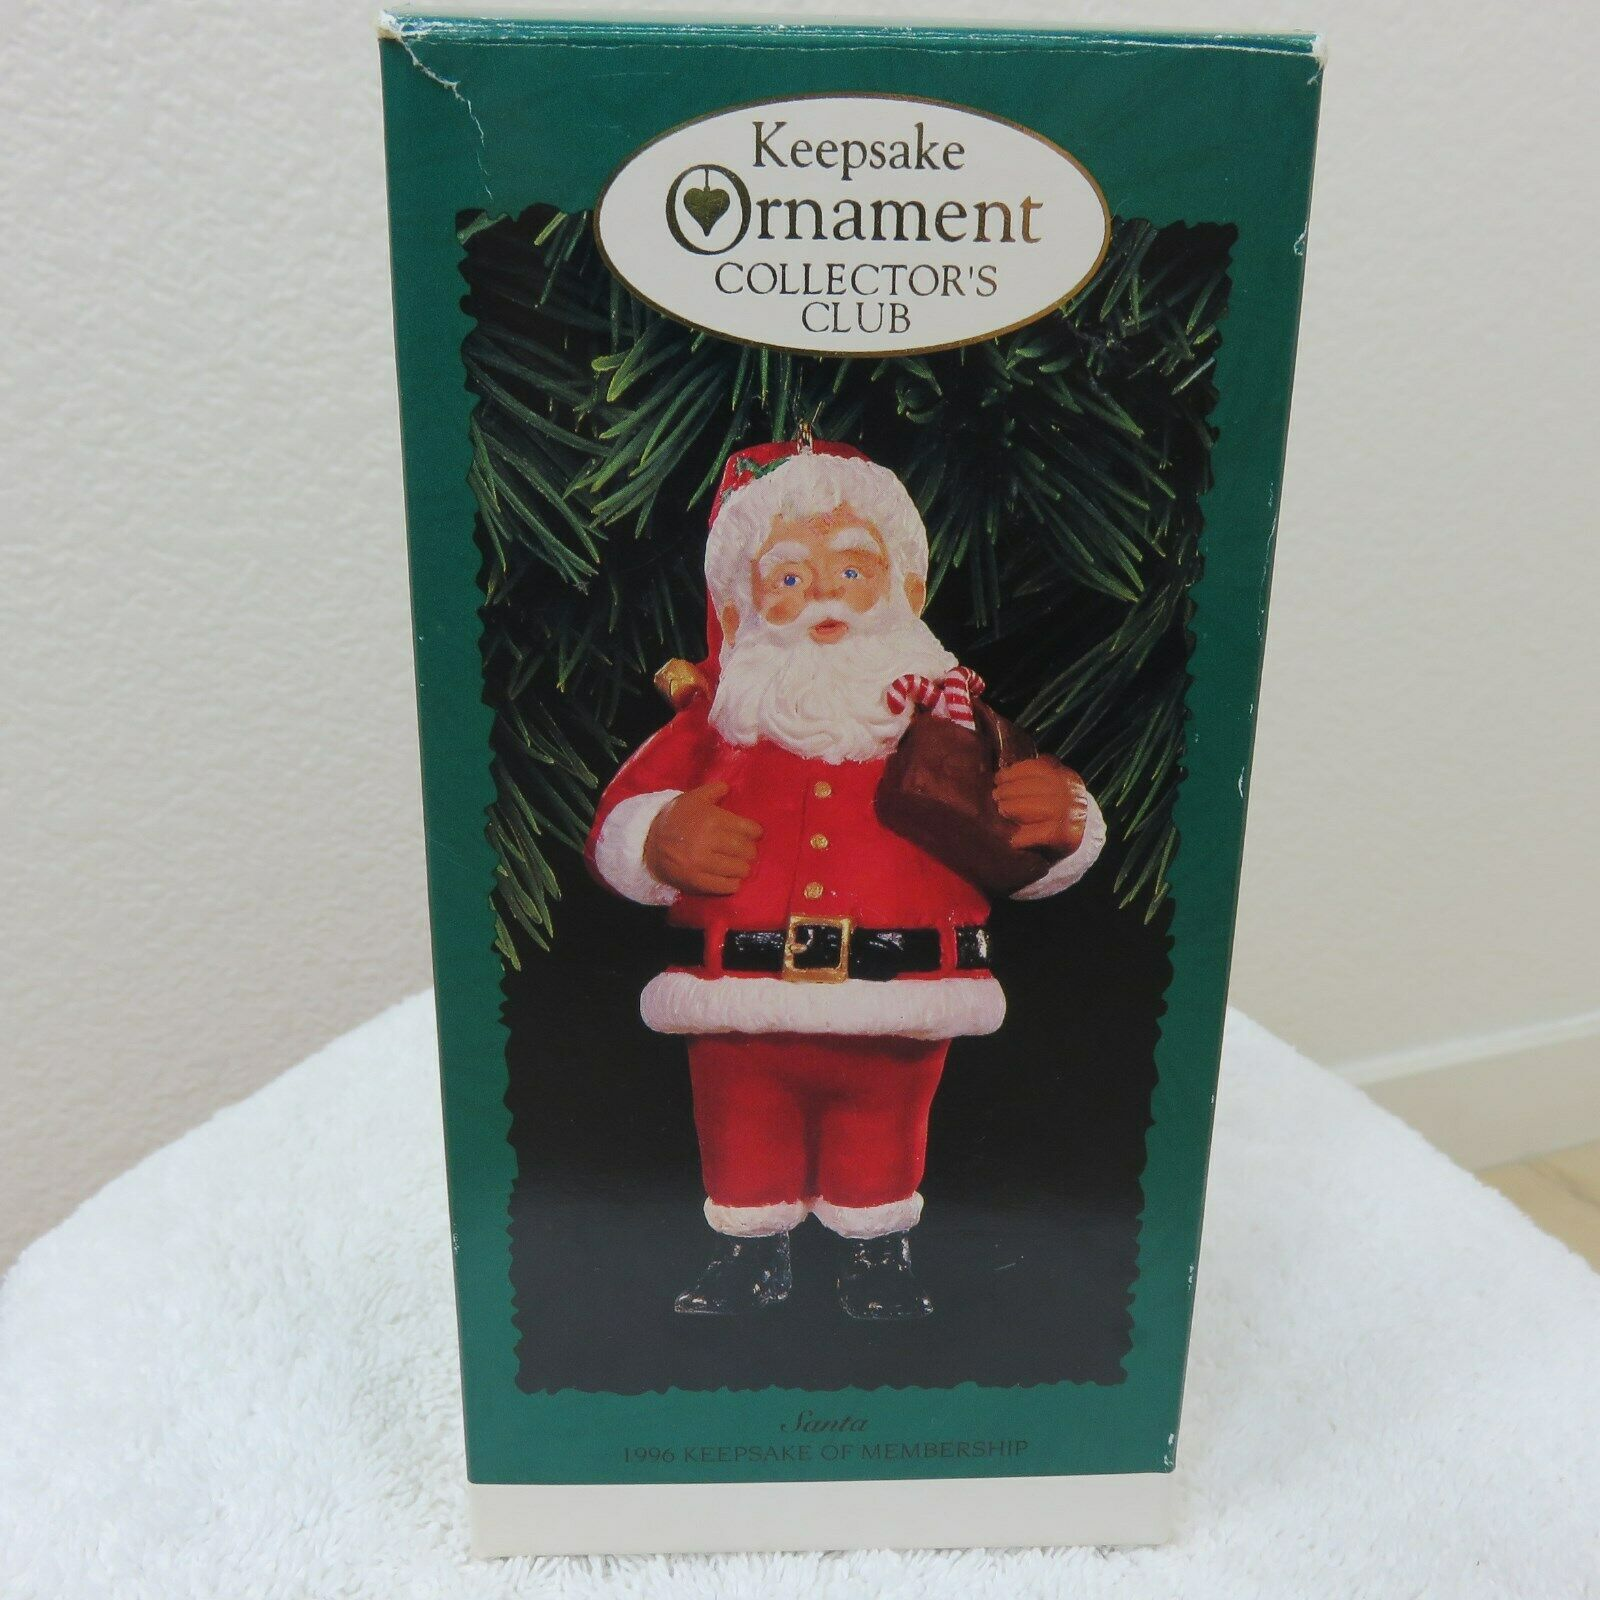 Vintage 1996 Hallmark Keepsake Ornament Santa in Original Box image 4